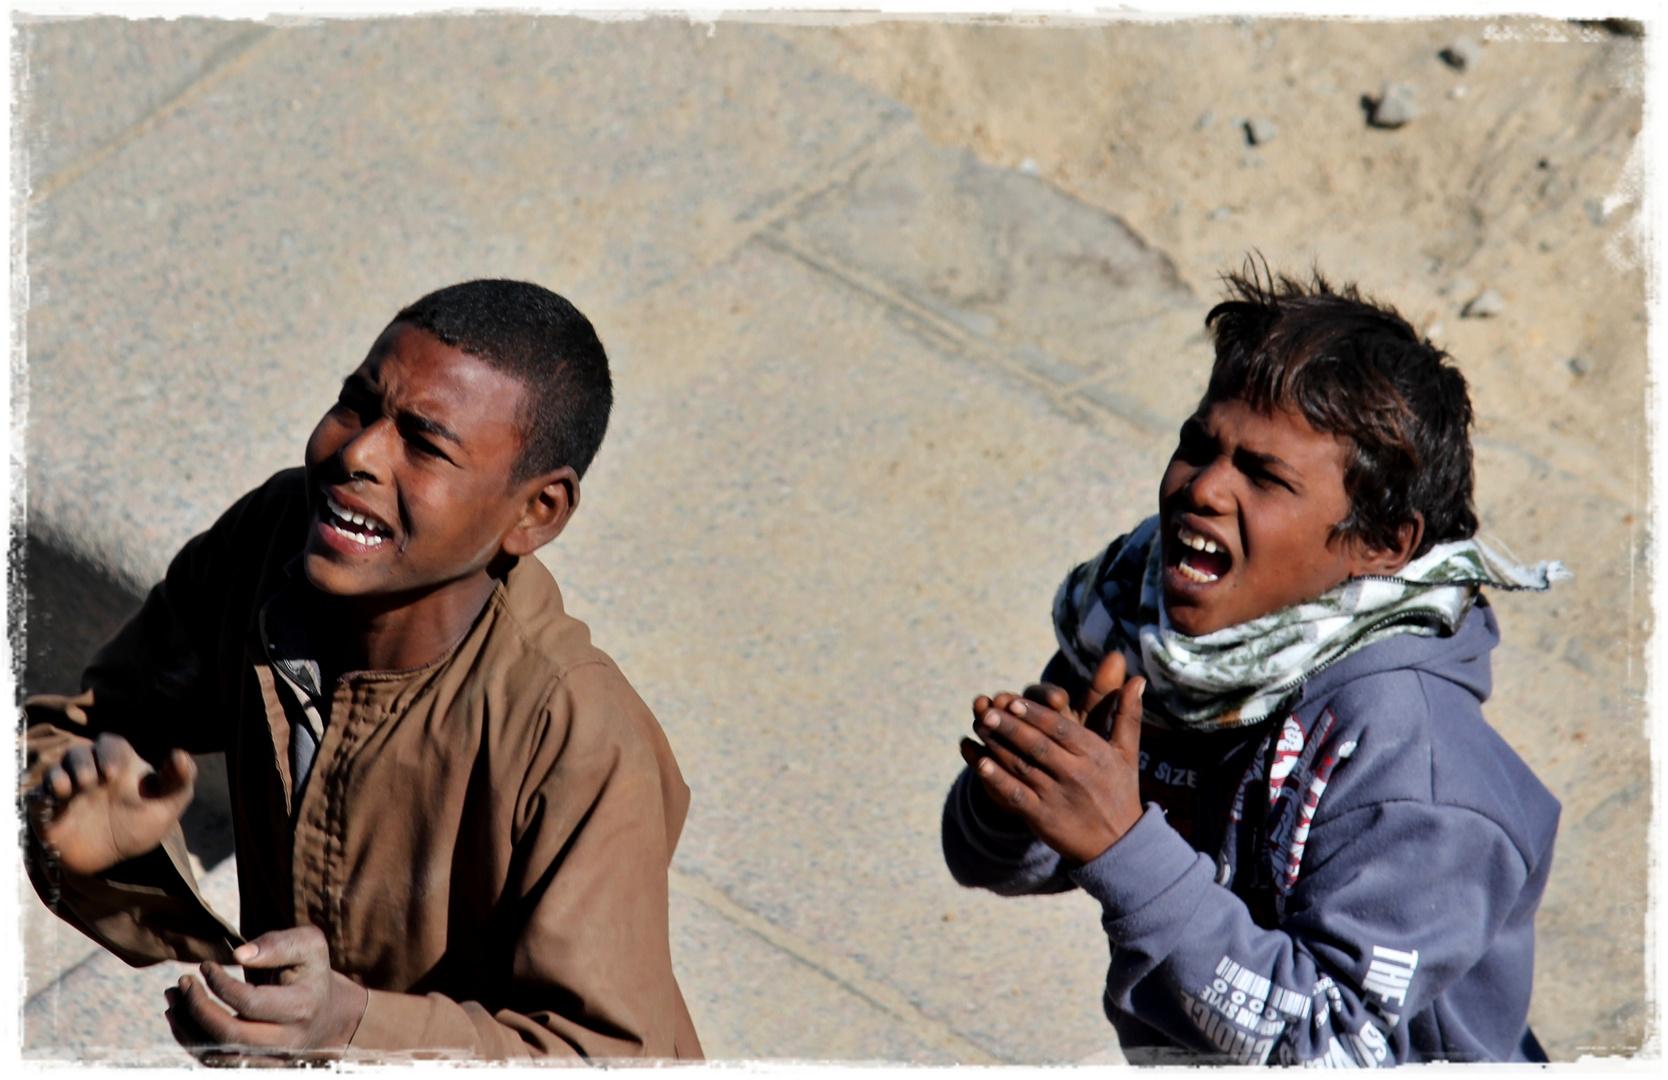 zwei Jungs in Ägypten